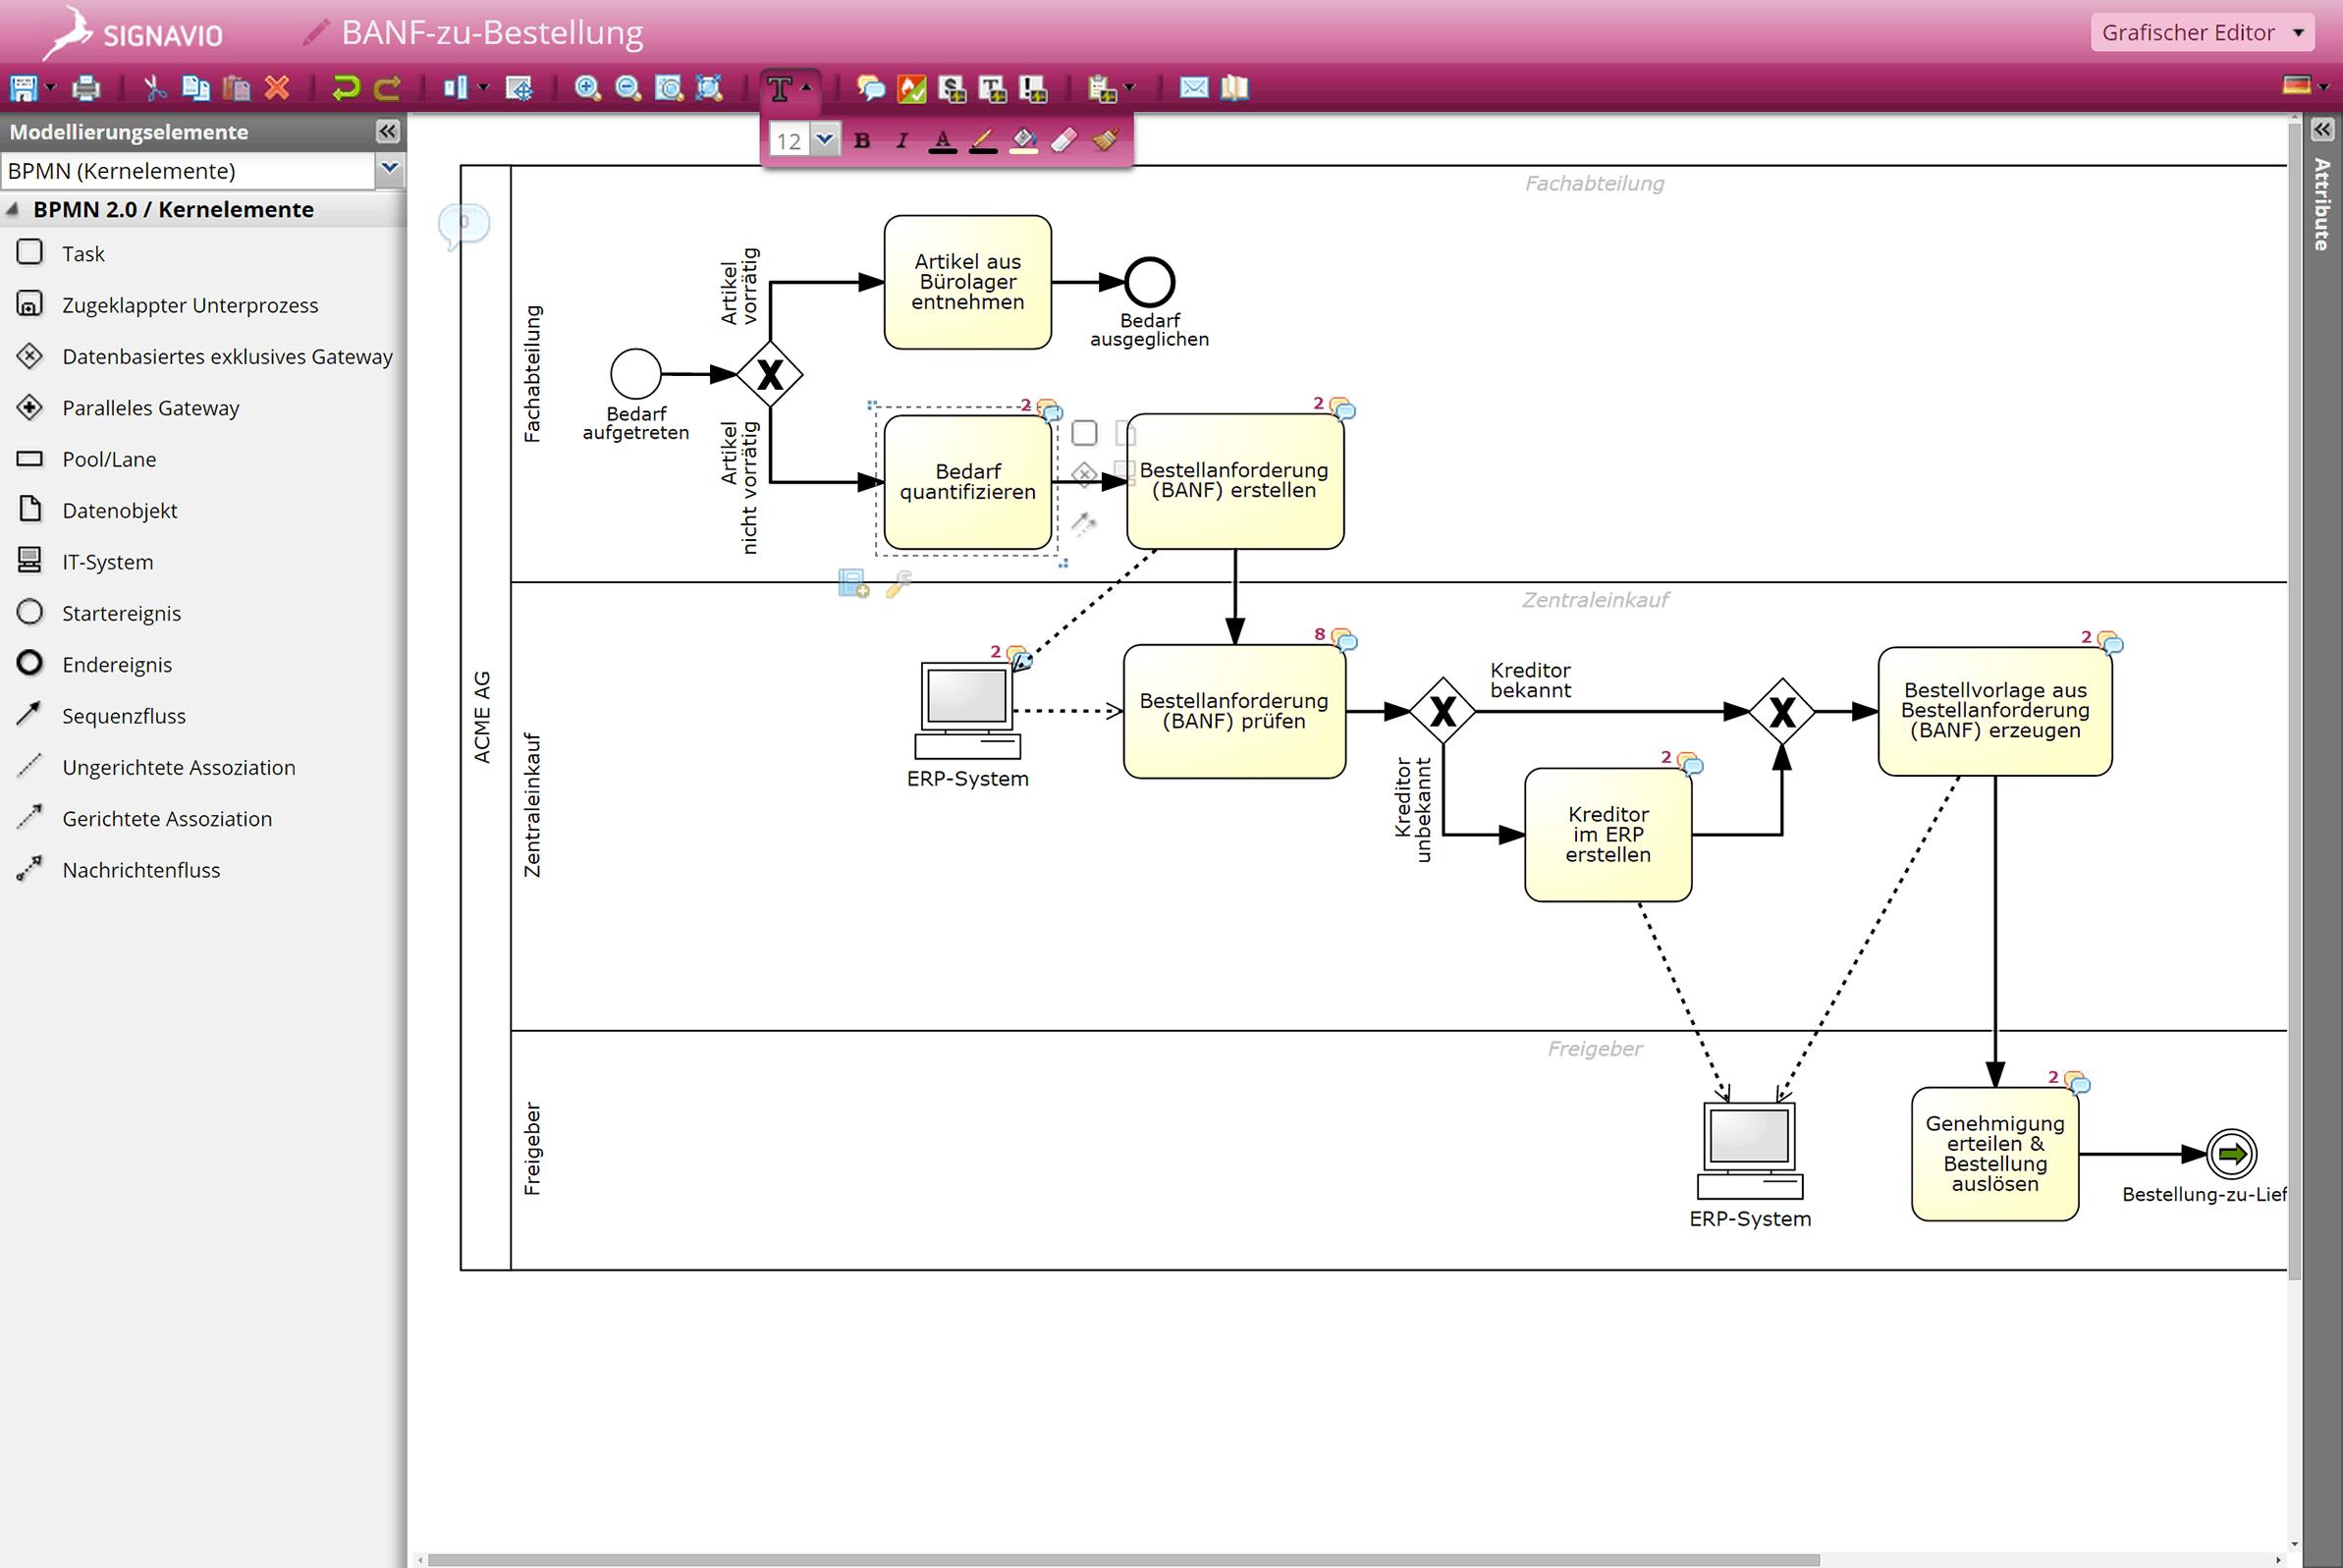 BPMN-2.0-Diagramm im Signavio Process Editor